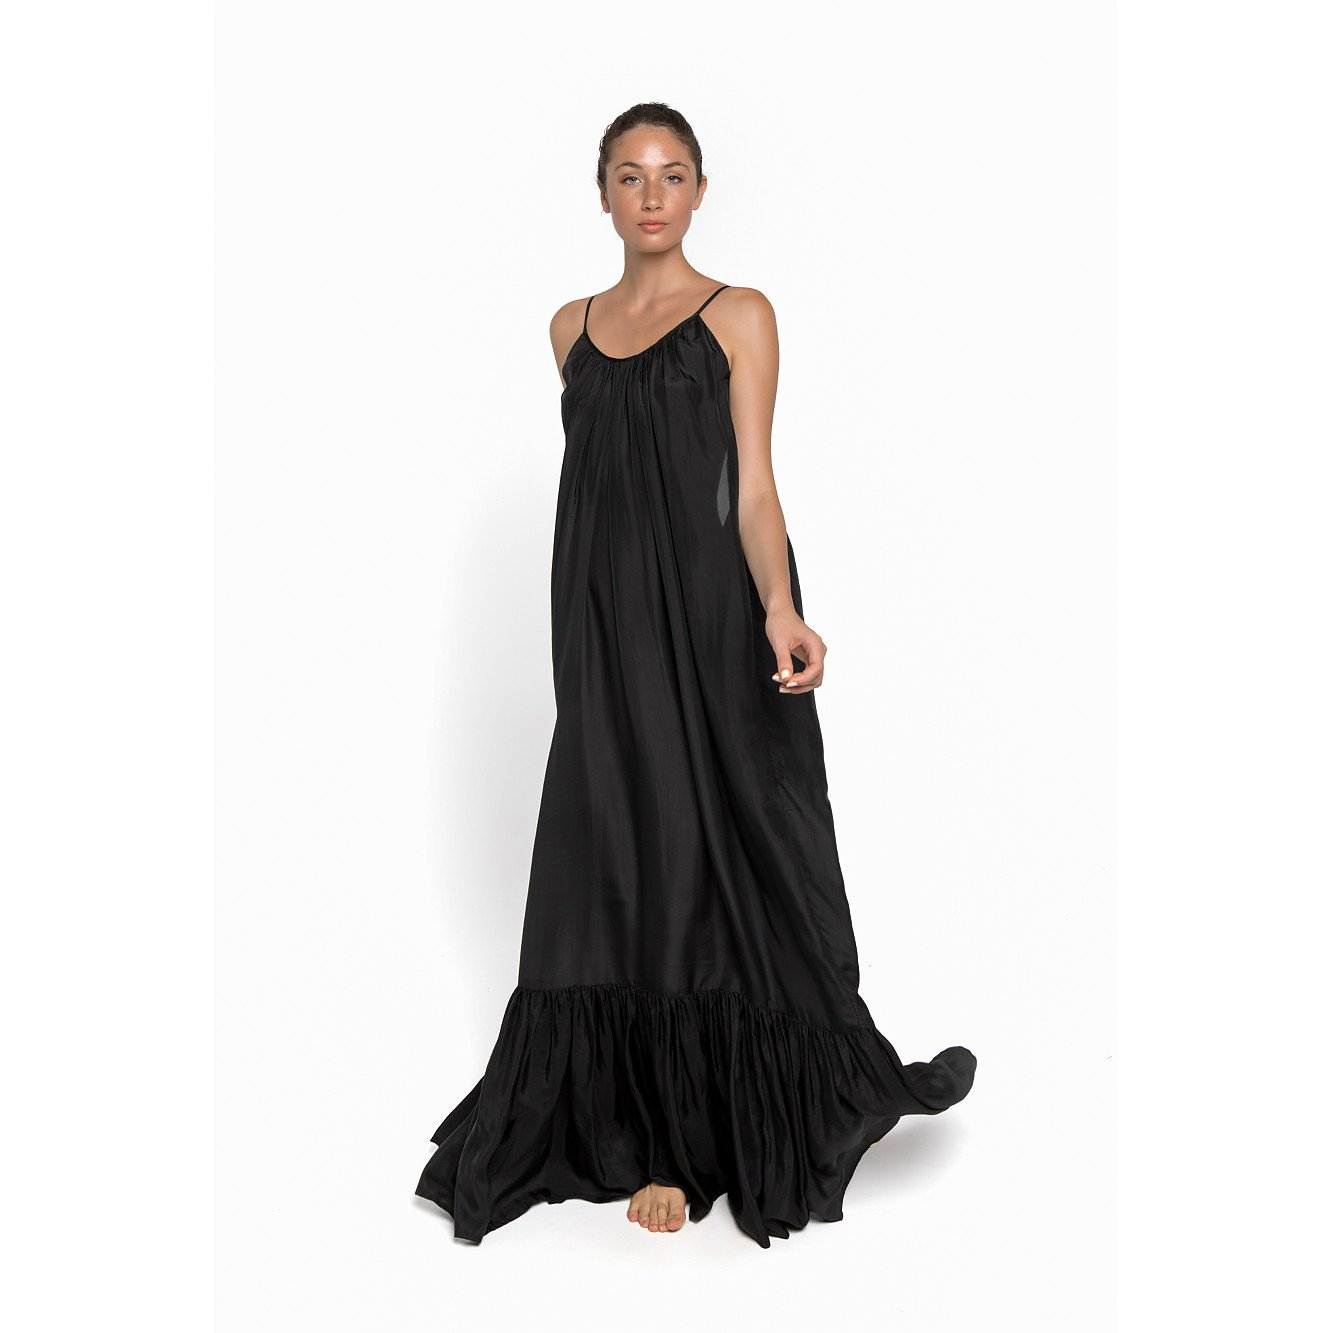 Kalita Brigitte Maxi Dress